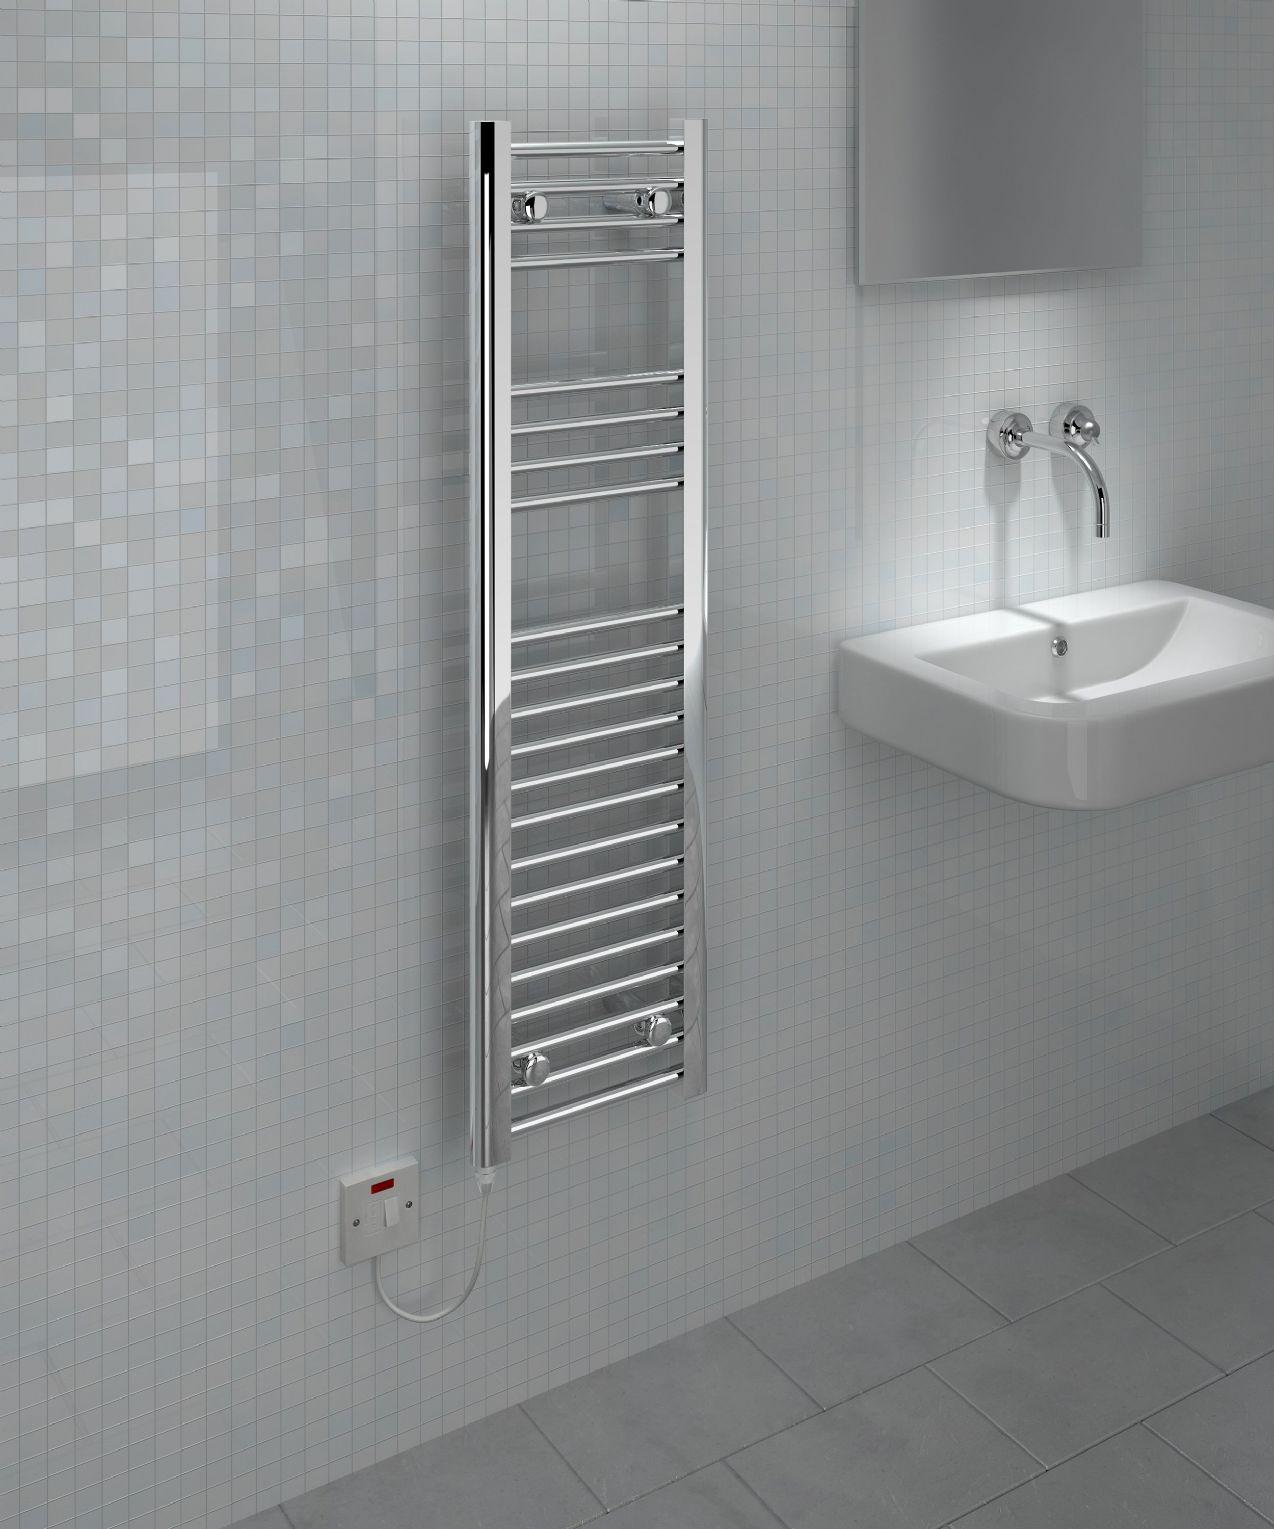 Kudox Slim Electric Towel Rail Chrome 150W 300 x 1100mm